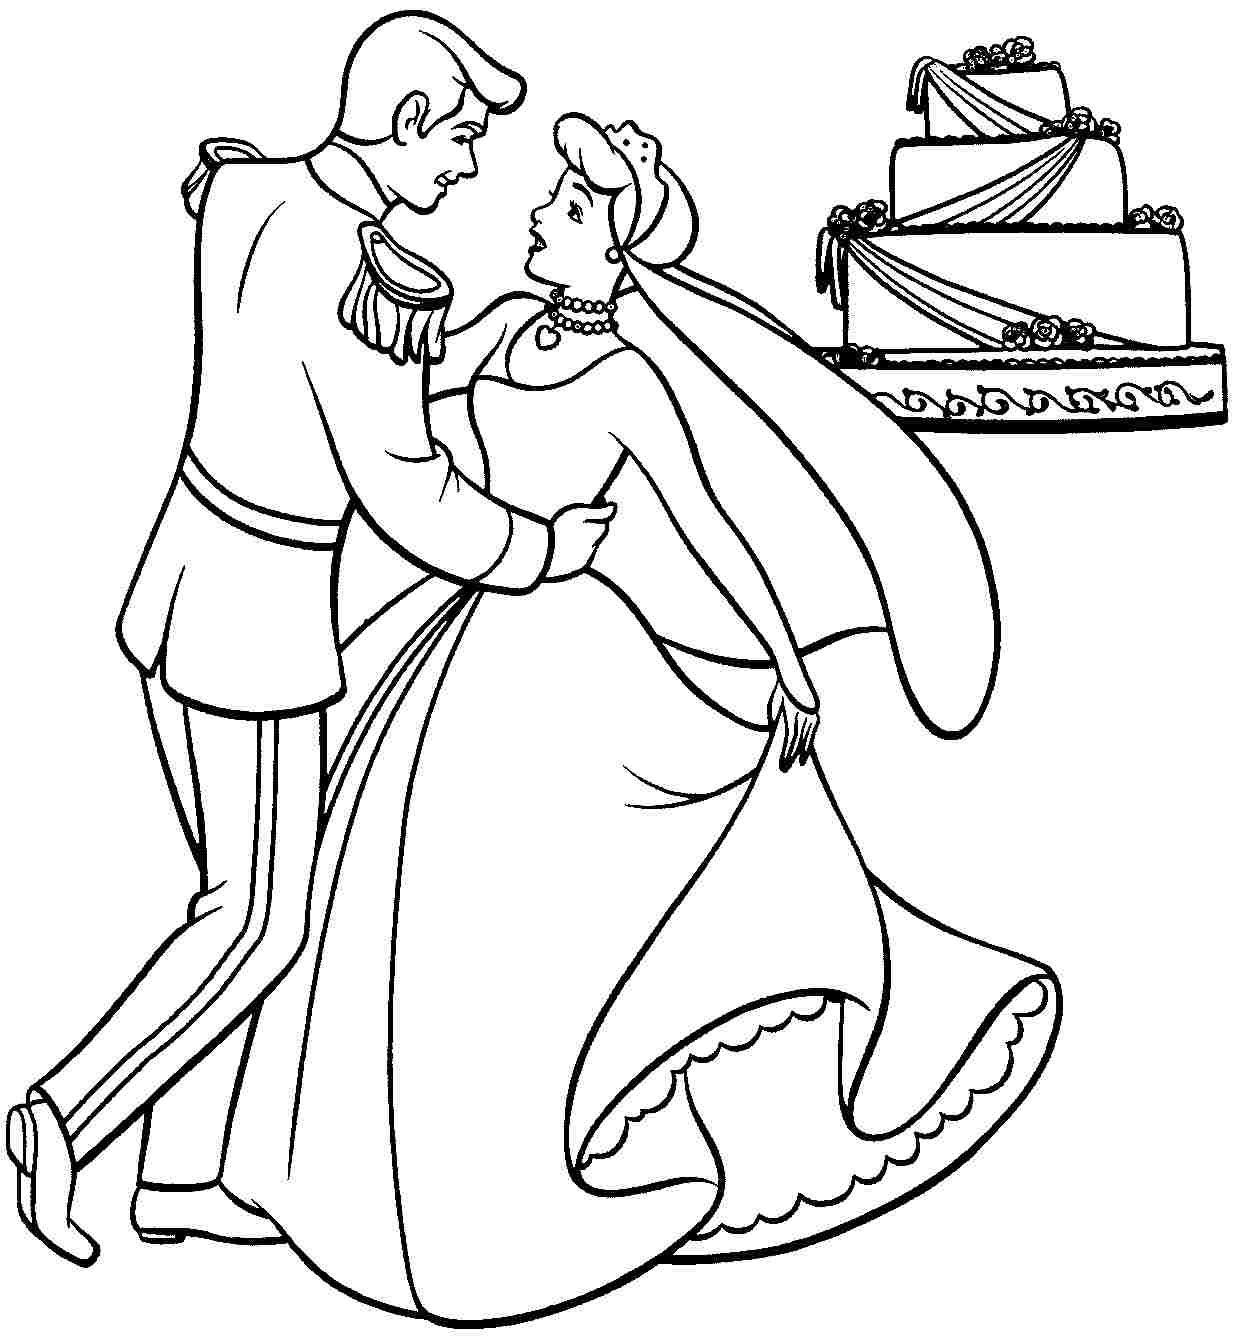 Coloring Pages Disney Princess Cinderella Printable For Kids #55111 ...